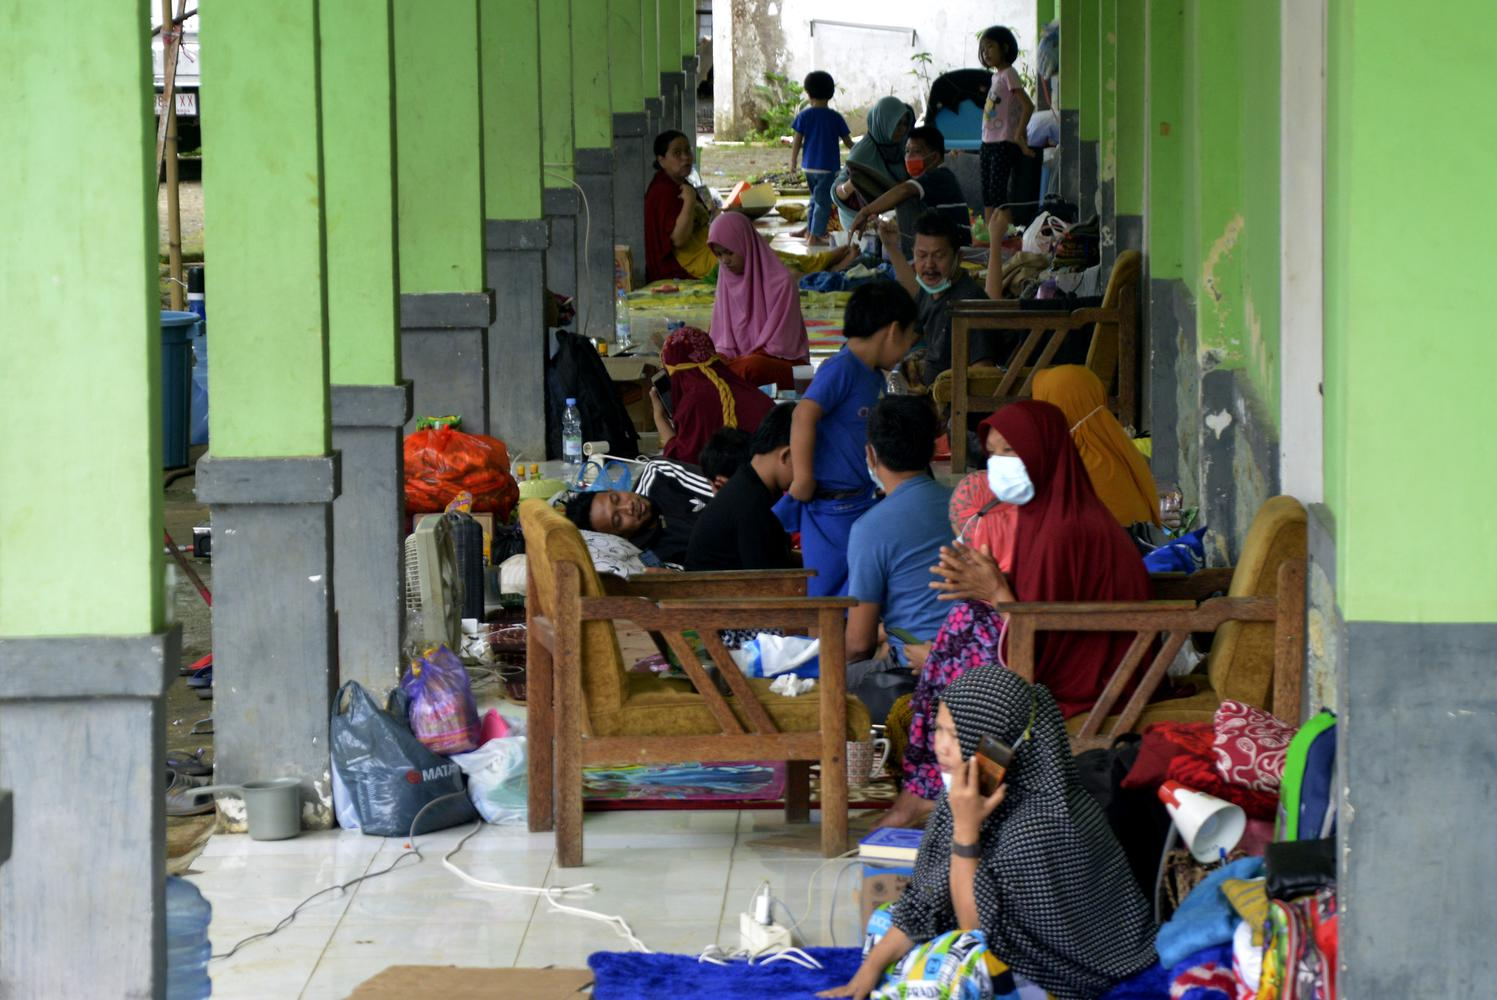 Warga korban gempa bumi mengungsi di teras Rumah Sakit Umum Kabupaten Mamuju di Sulawesi Barat, Minggu (17/1/2021). Sebanyak 27.850 jiwa telah mengungsi di sejumlah posko pengungsian karena rumah mereka rusak akibat gempa bumi berkekuatan magnitudo 6,2 yang terjadi pada Jumat (15/1) dini hari yang juga mengakibatkan 73 orang meninggal dunia.